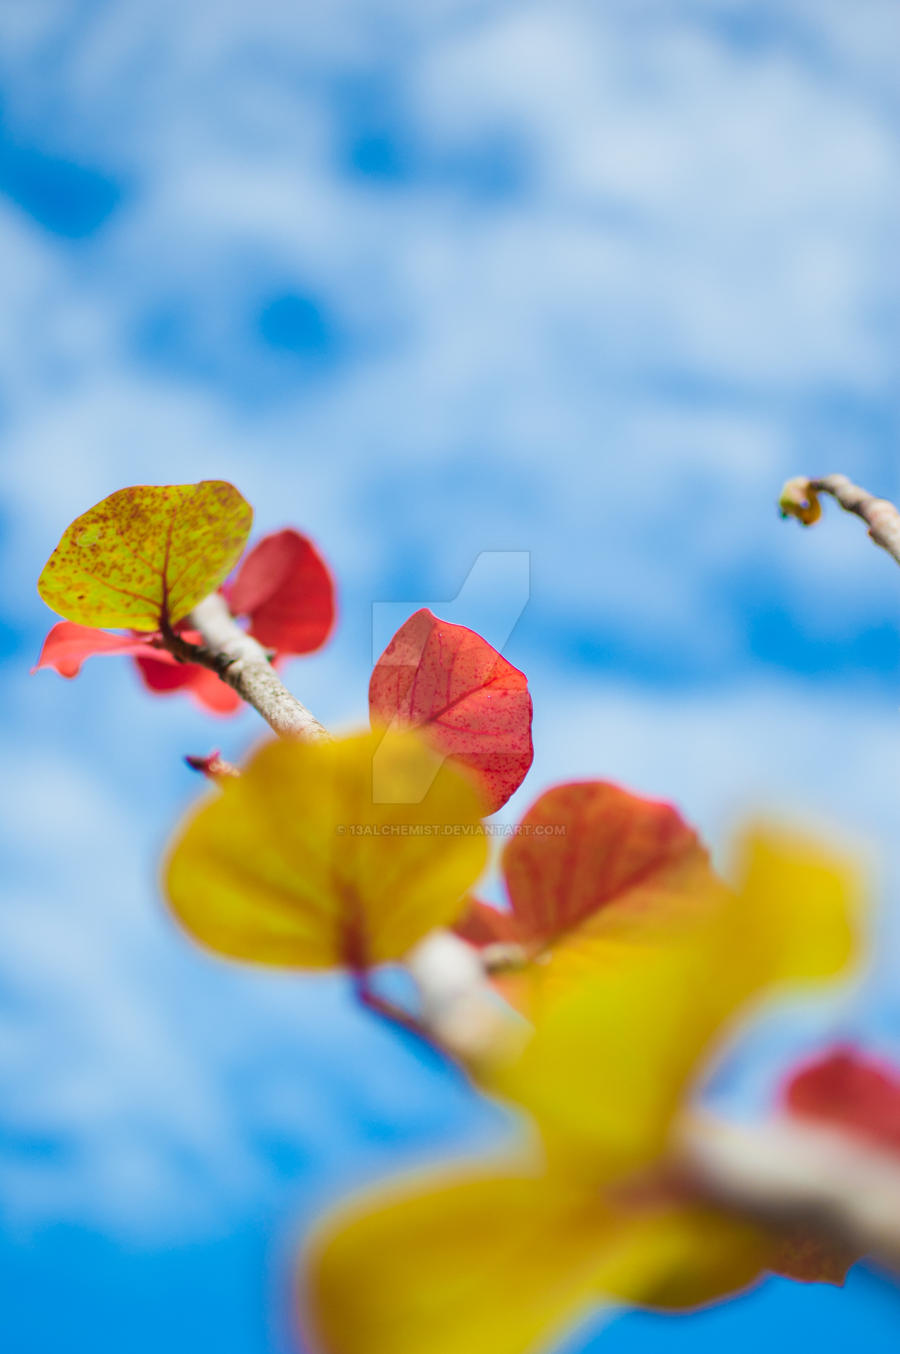 leafing reality by 13Alchemist